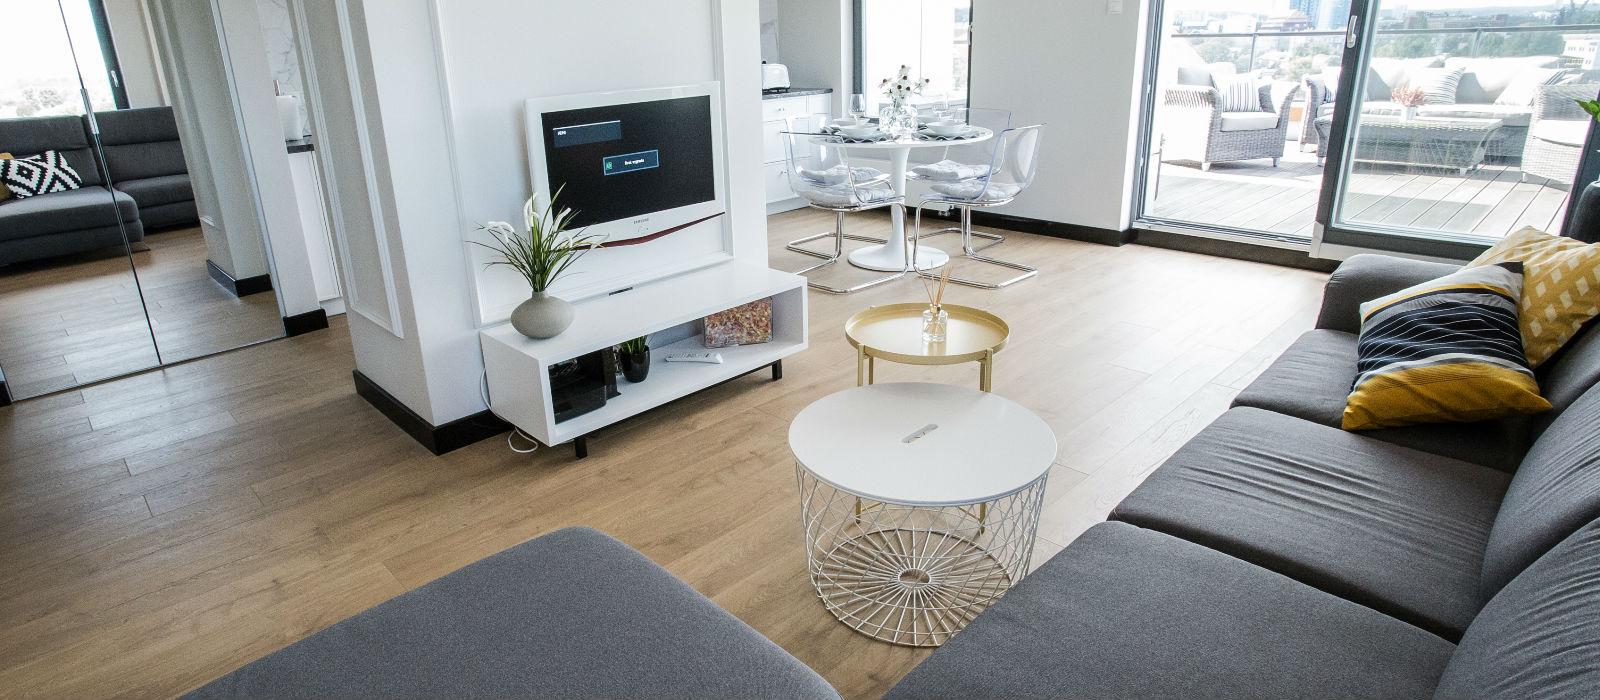 apartament gdańsk ab home